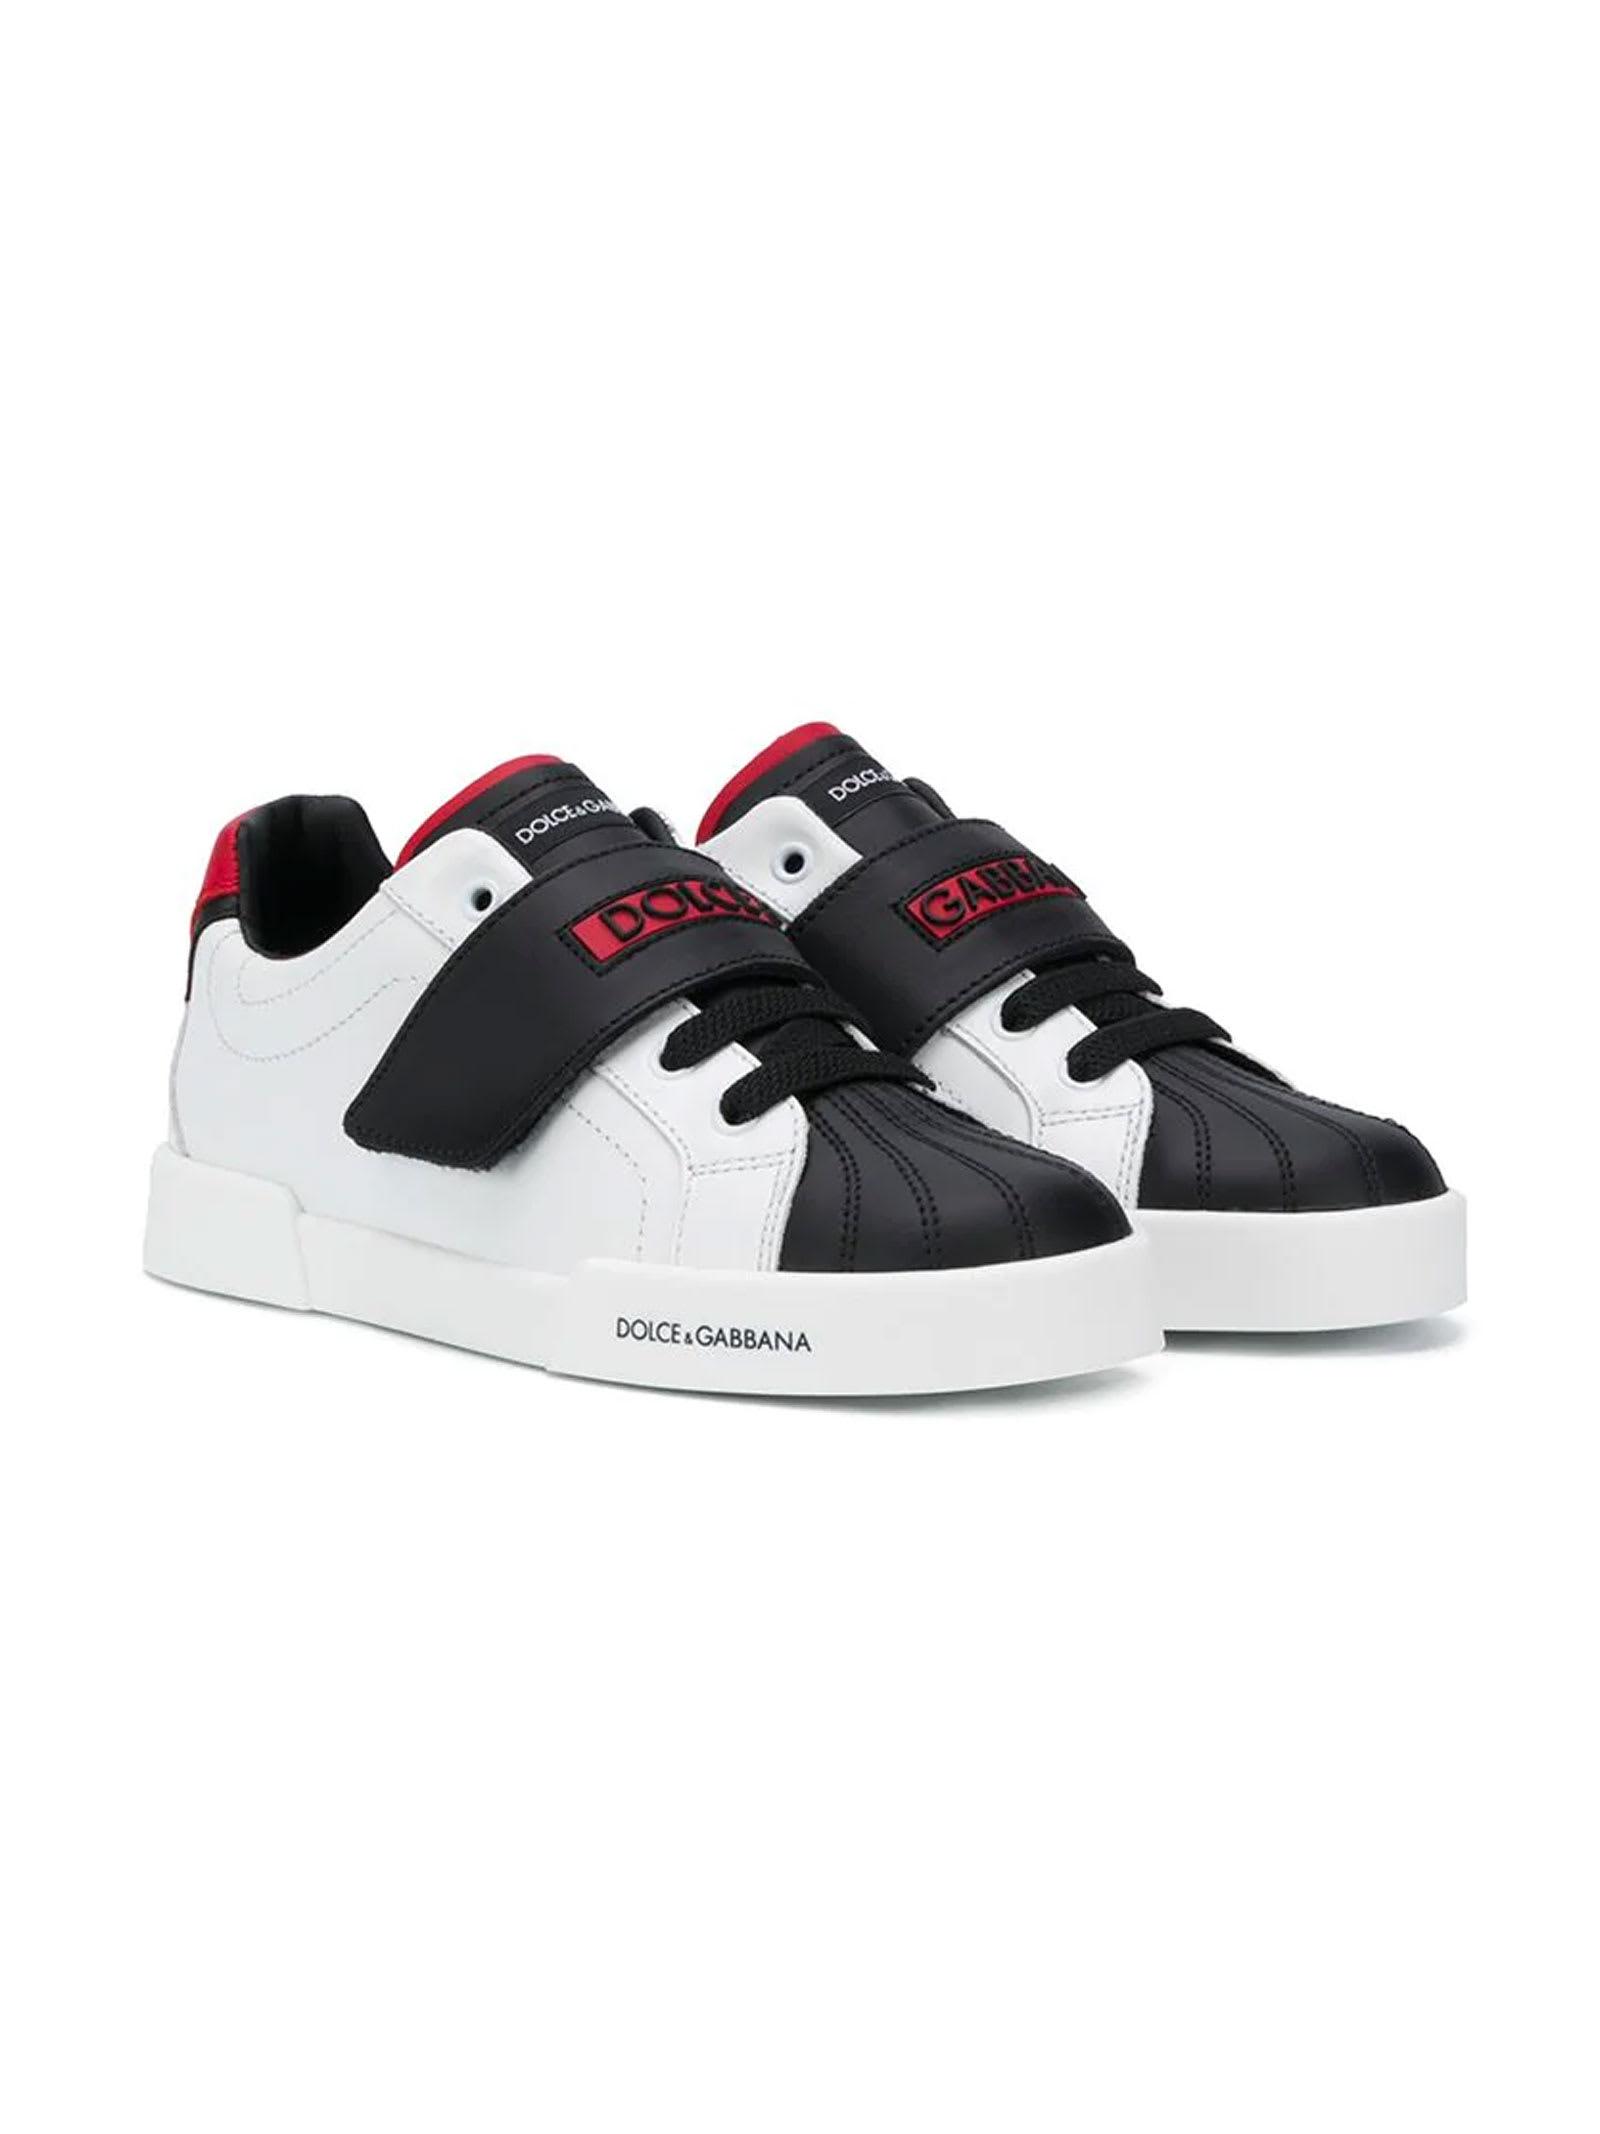 Dolce & Gabbana Black And White Sneakers Dolce & gabbana Kids